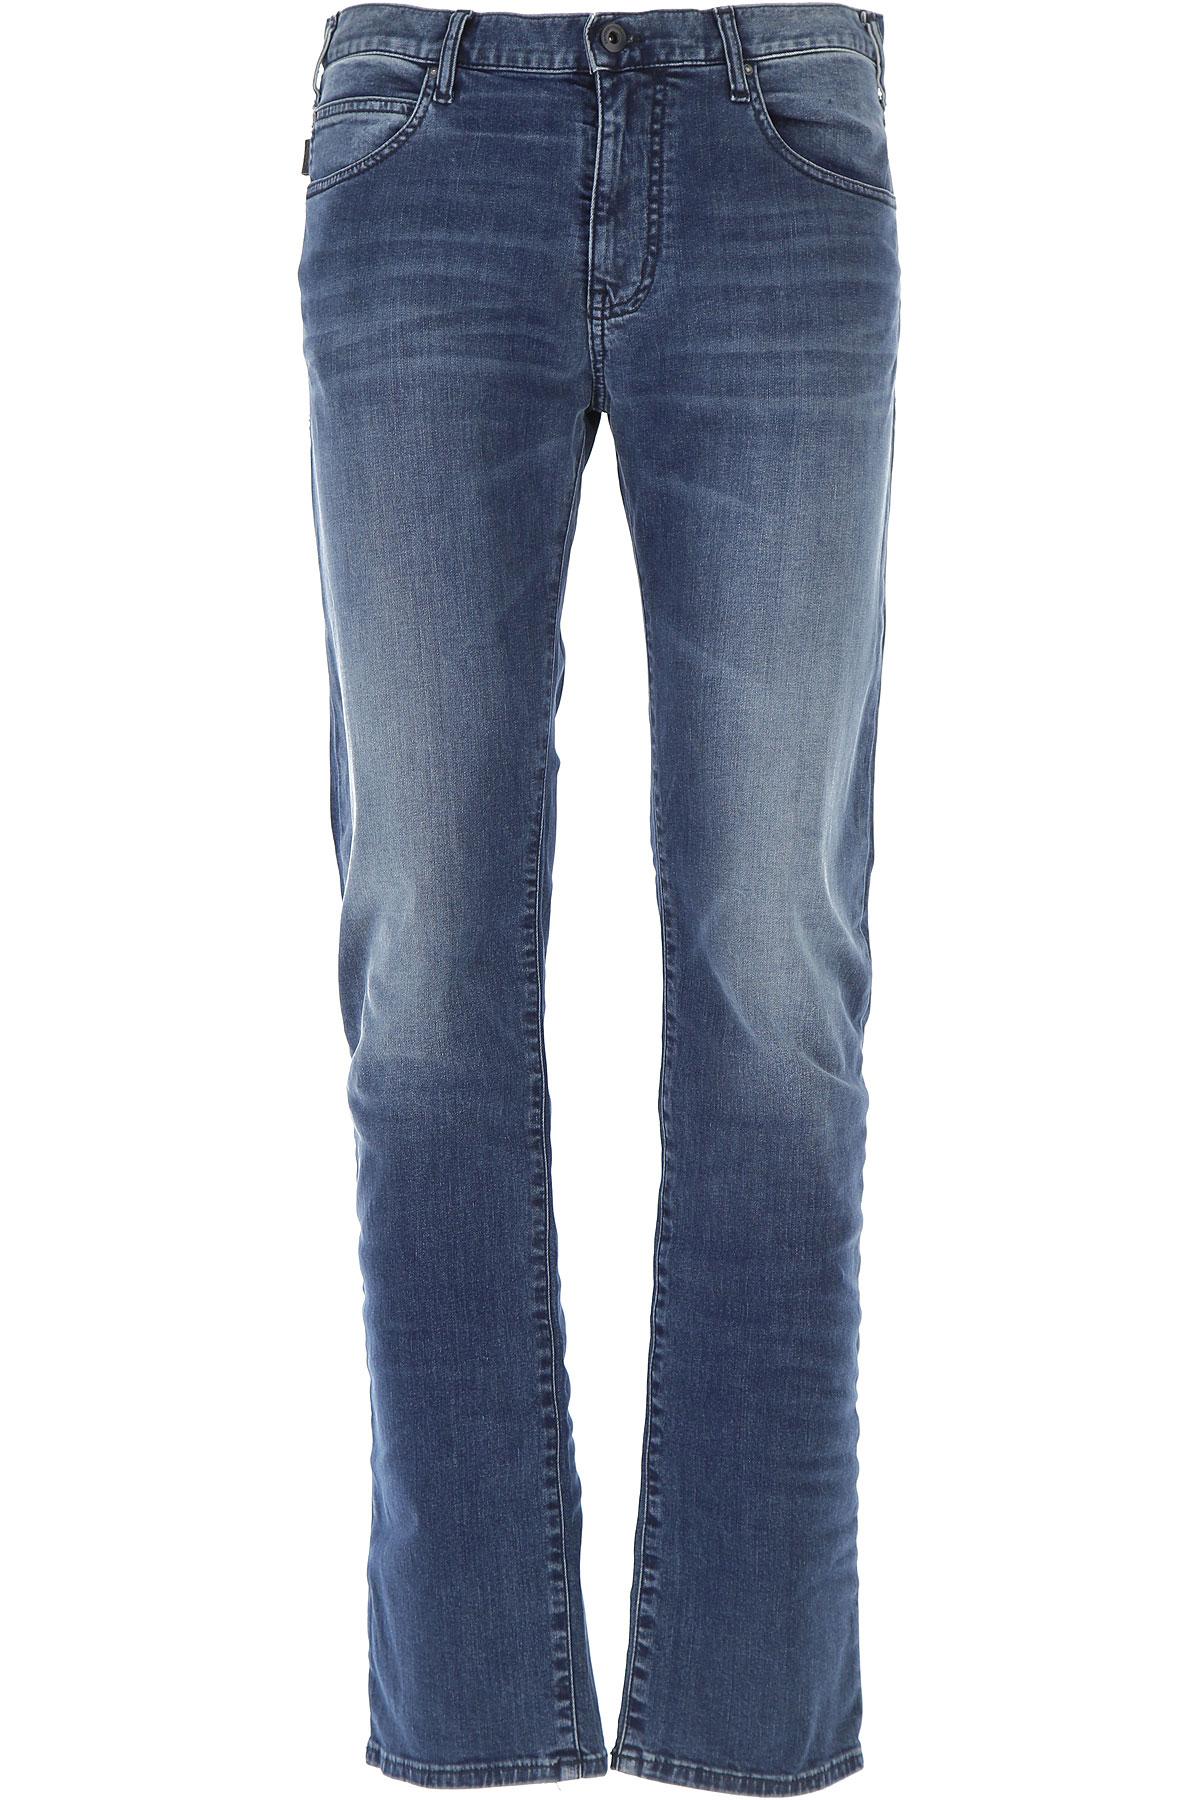 Emporio Armani Jeans On Sale, Denim Blue, Cotton, 2017, 33 36